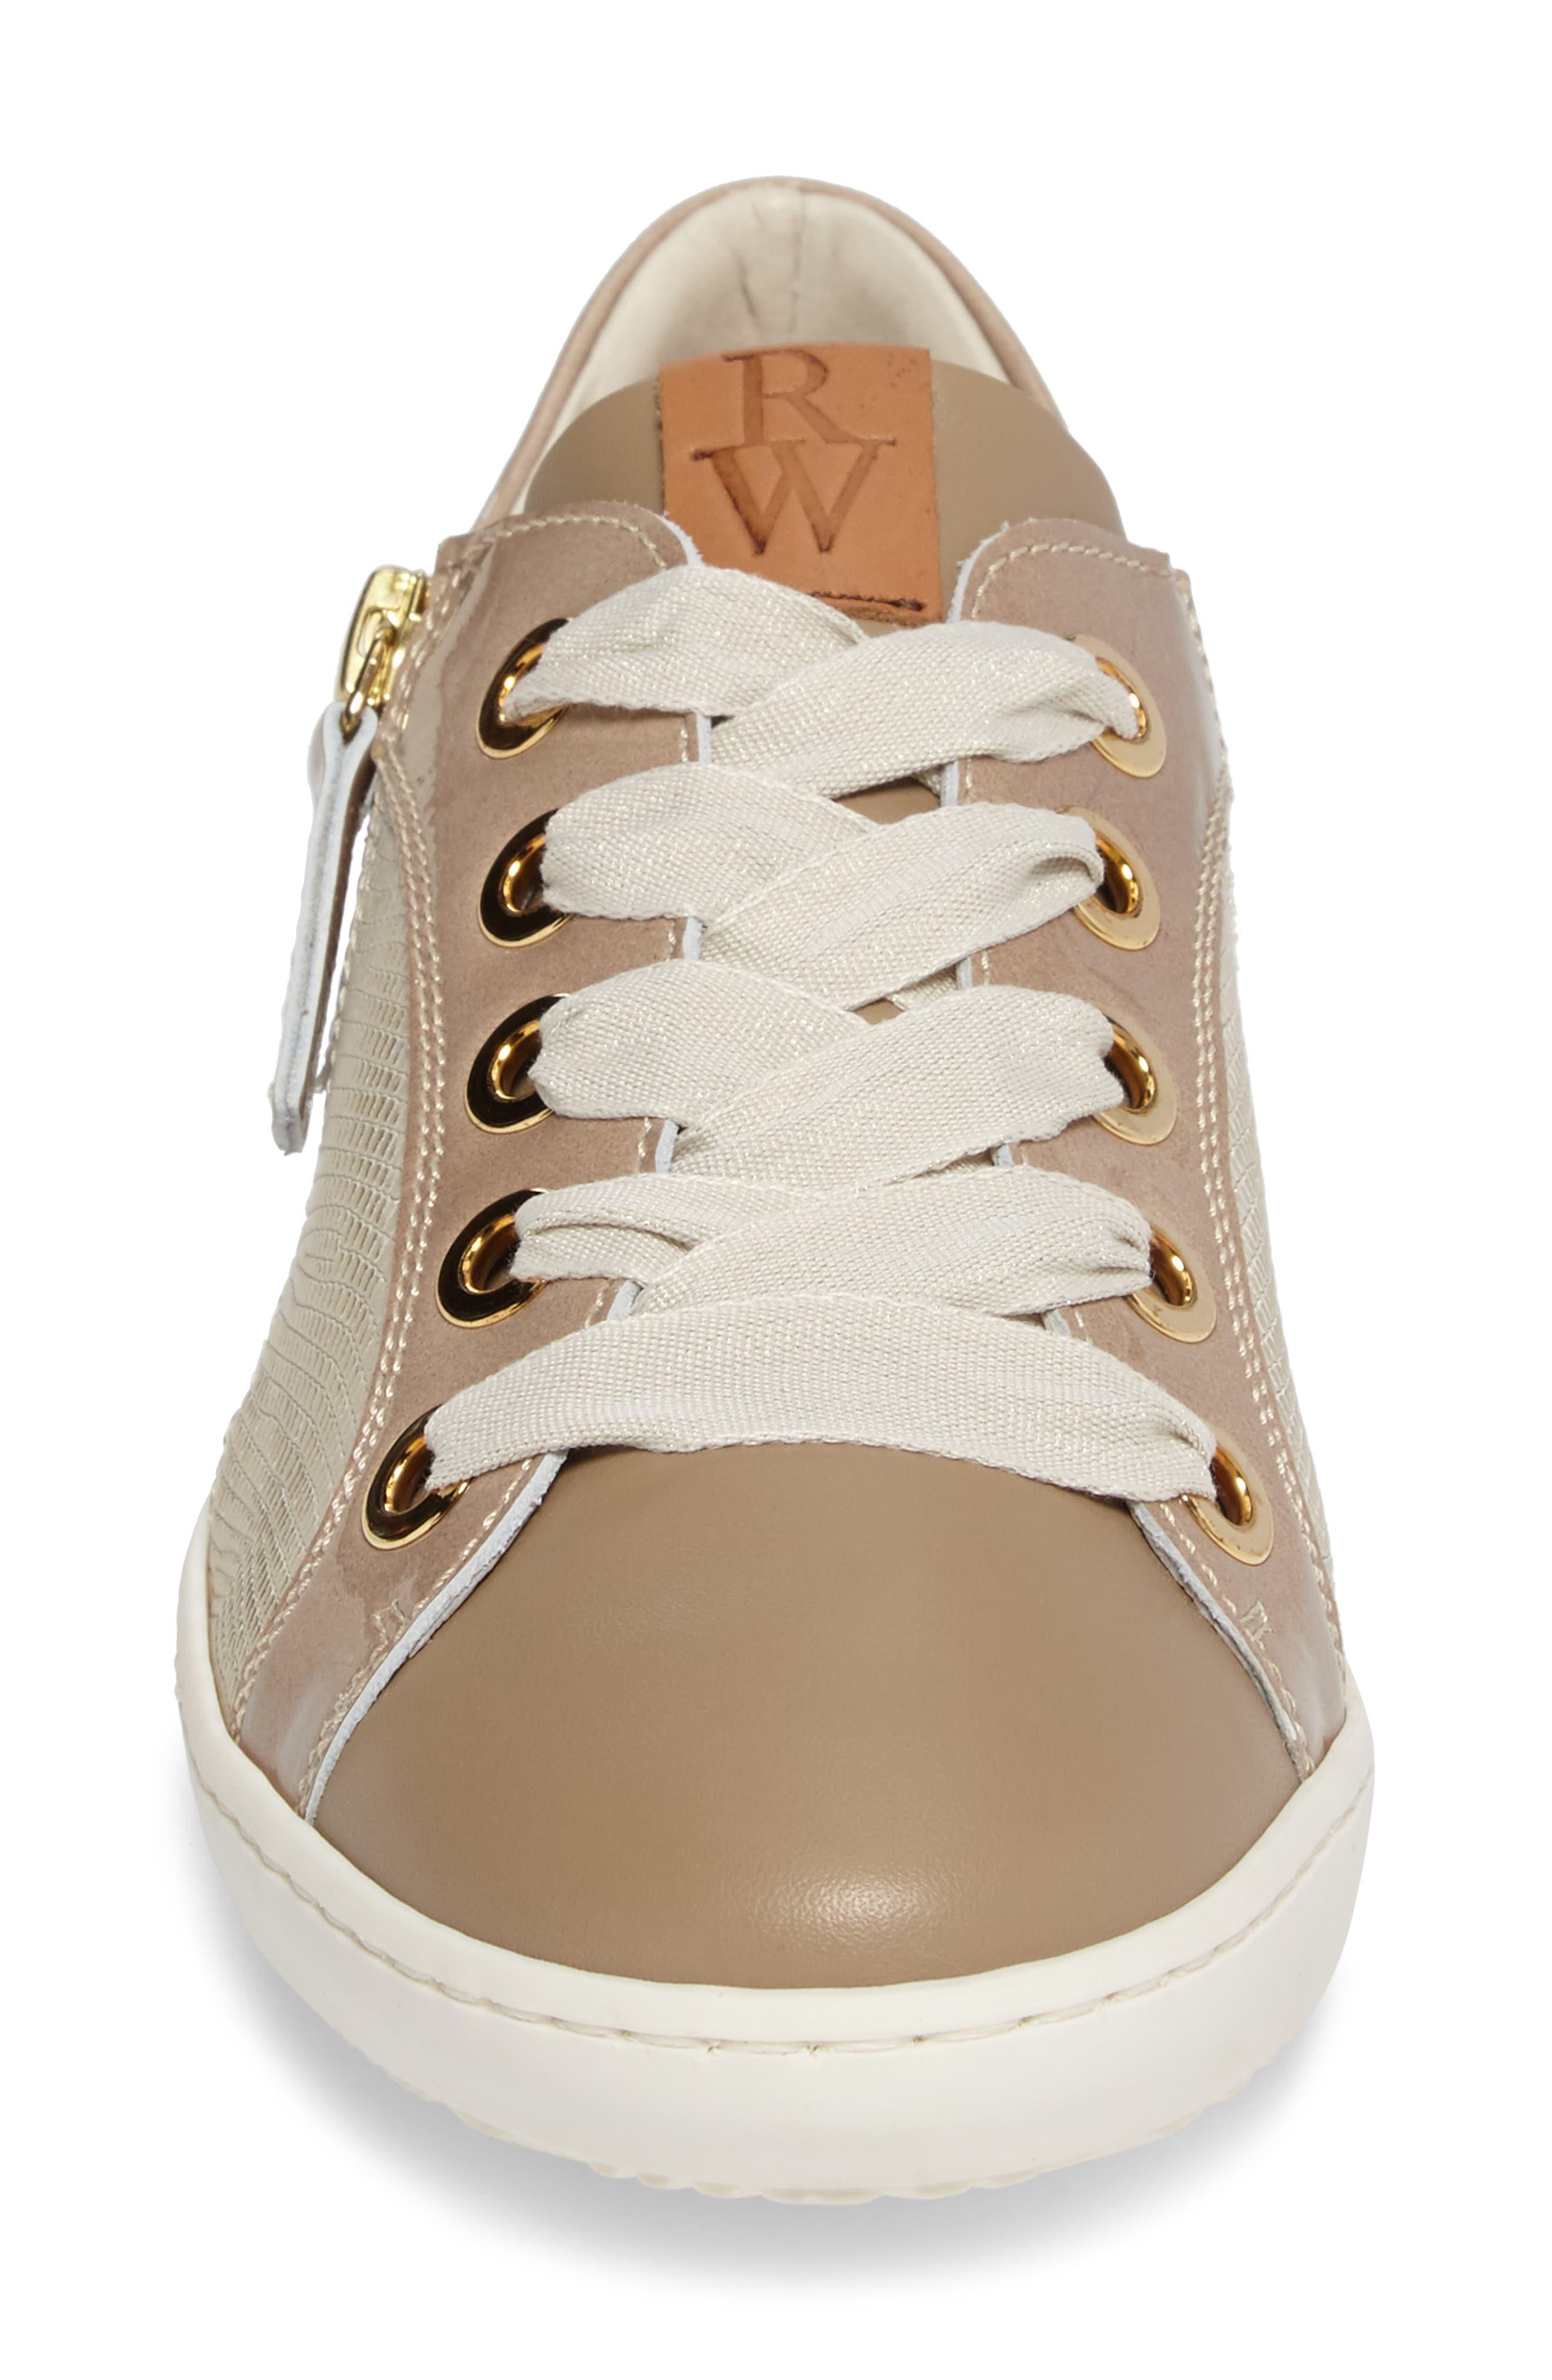 May Sneaker,                             Alternate thumbnail 4, color,                             270